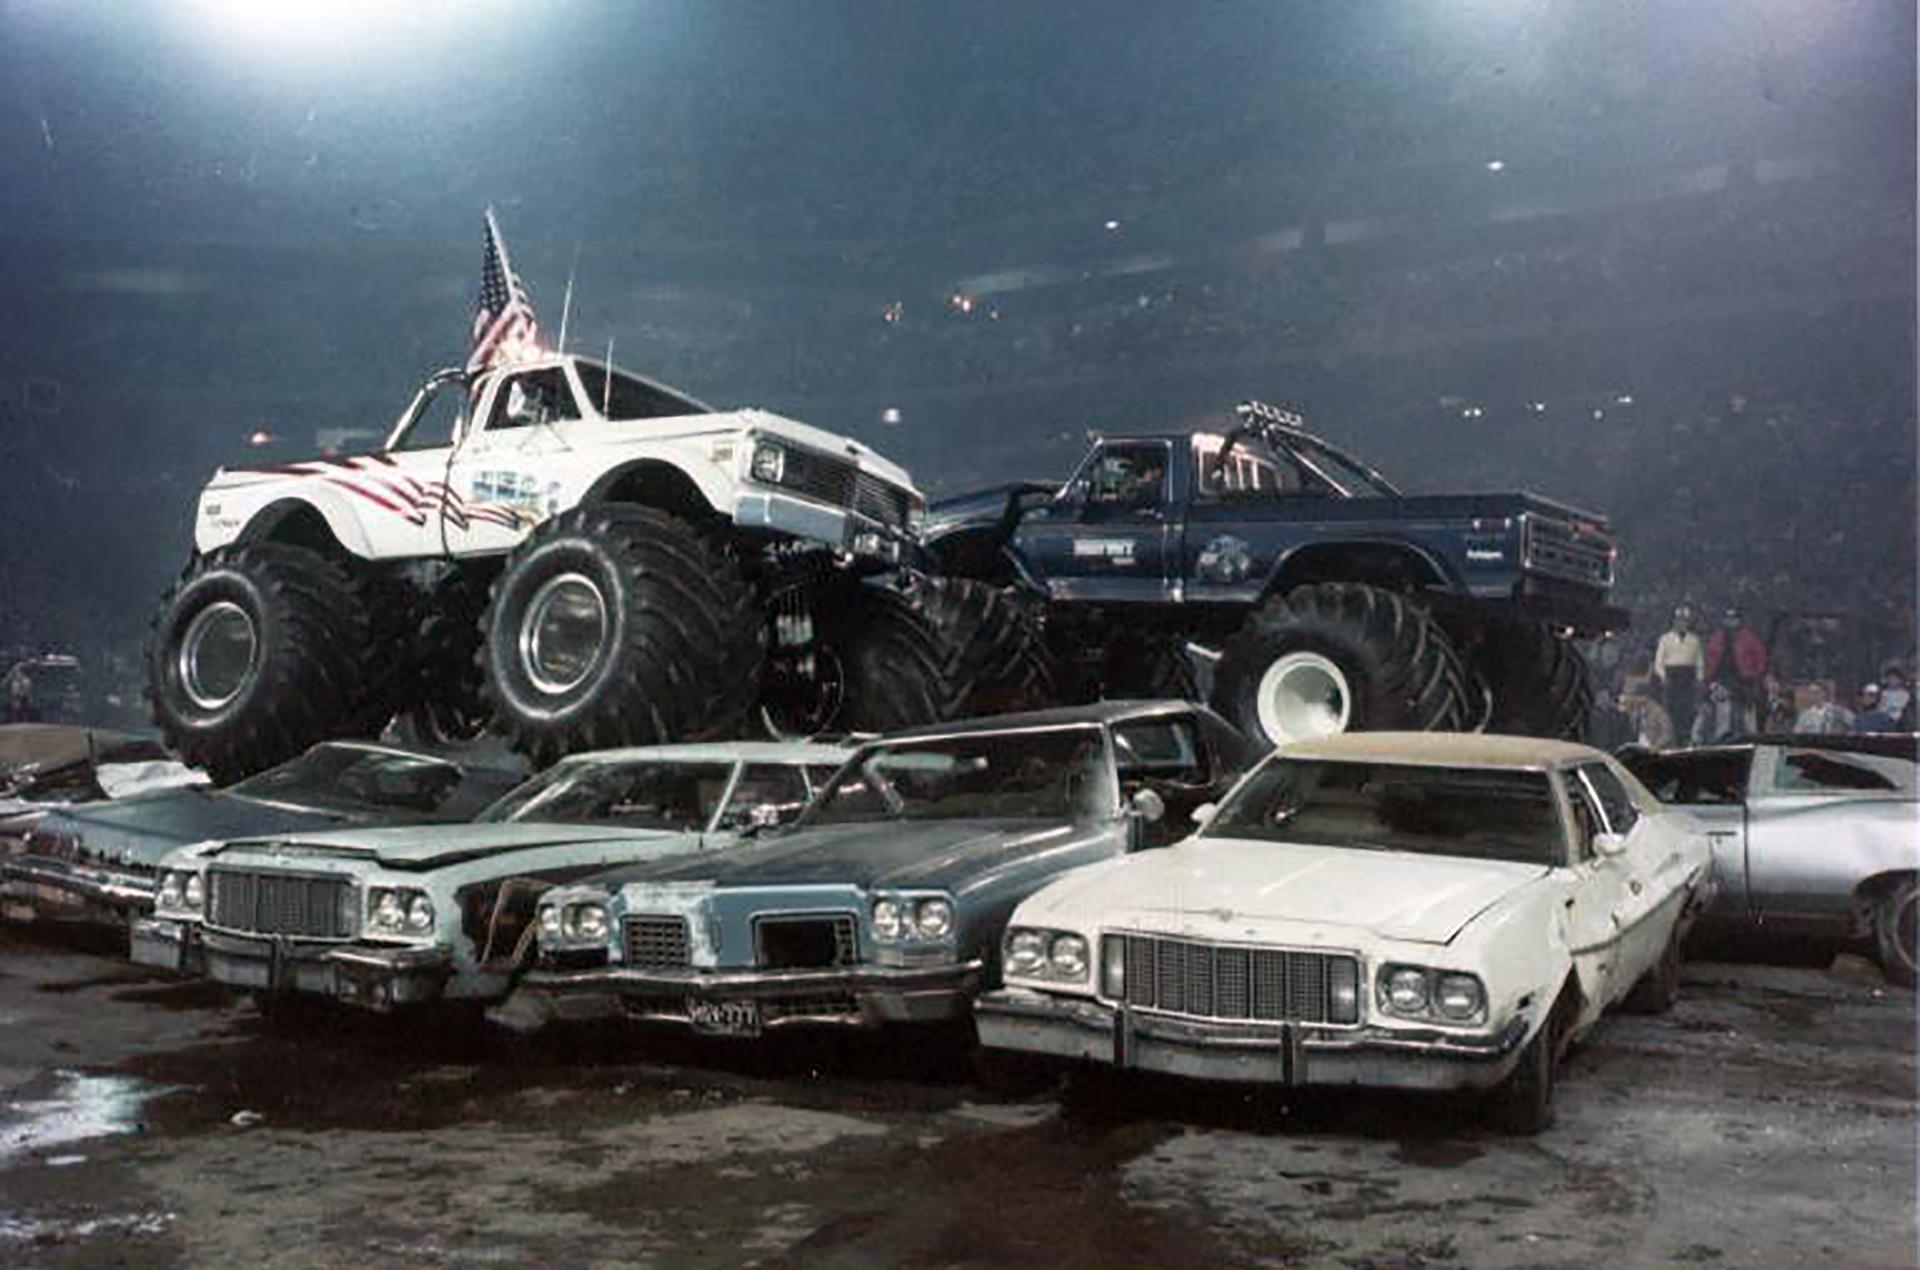 Bigfoot Vs Usa 1 The Birth Of Monster Truck Madness History